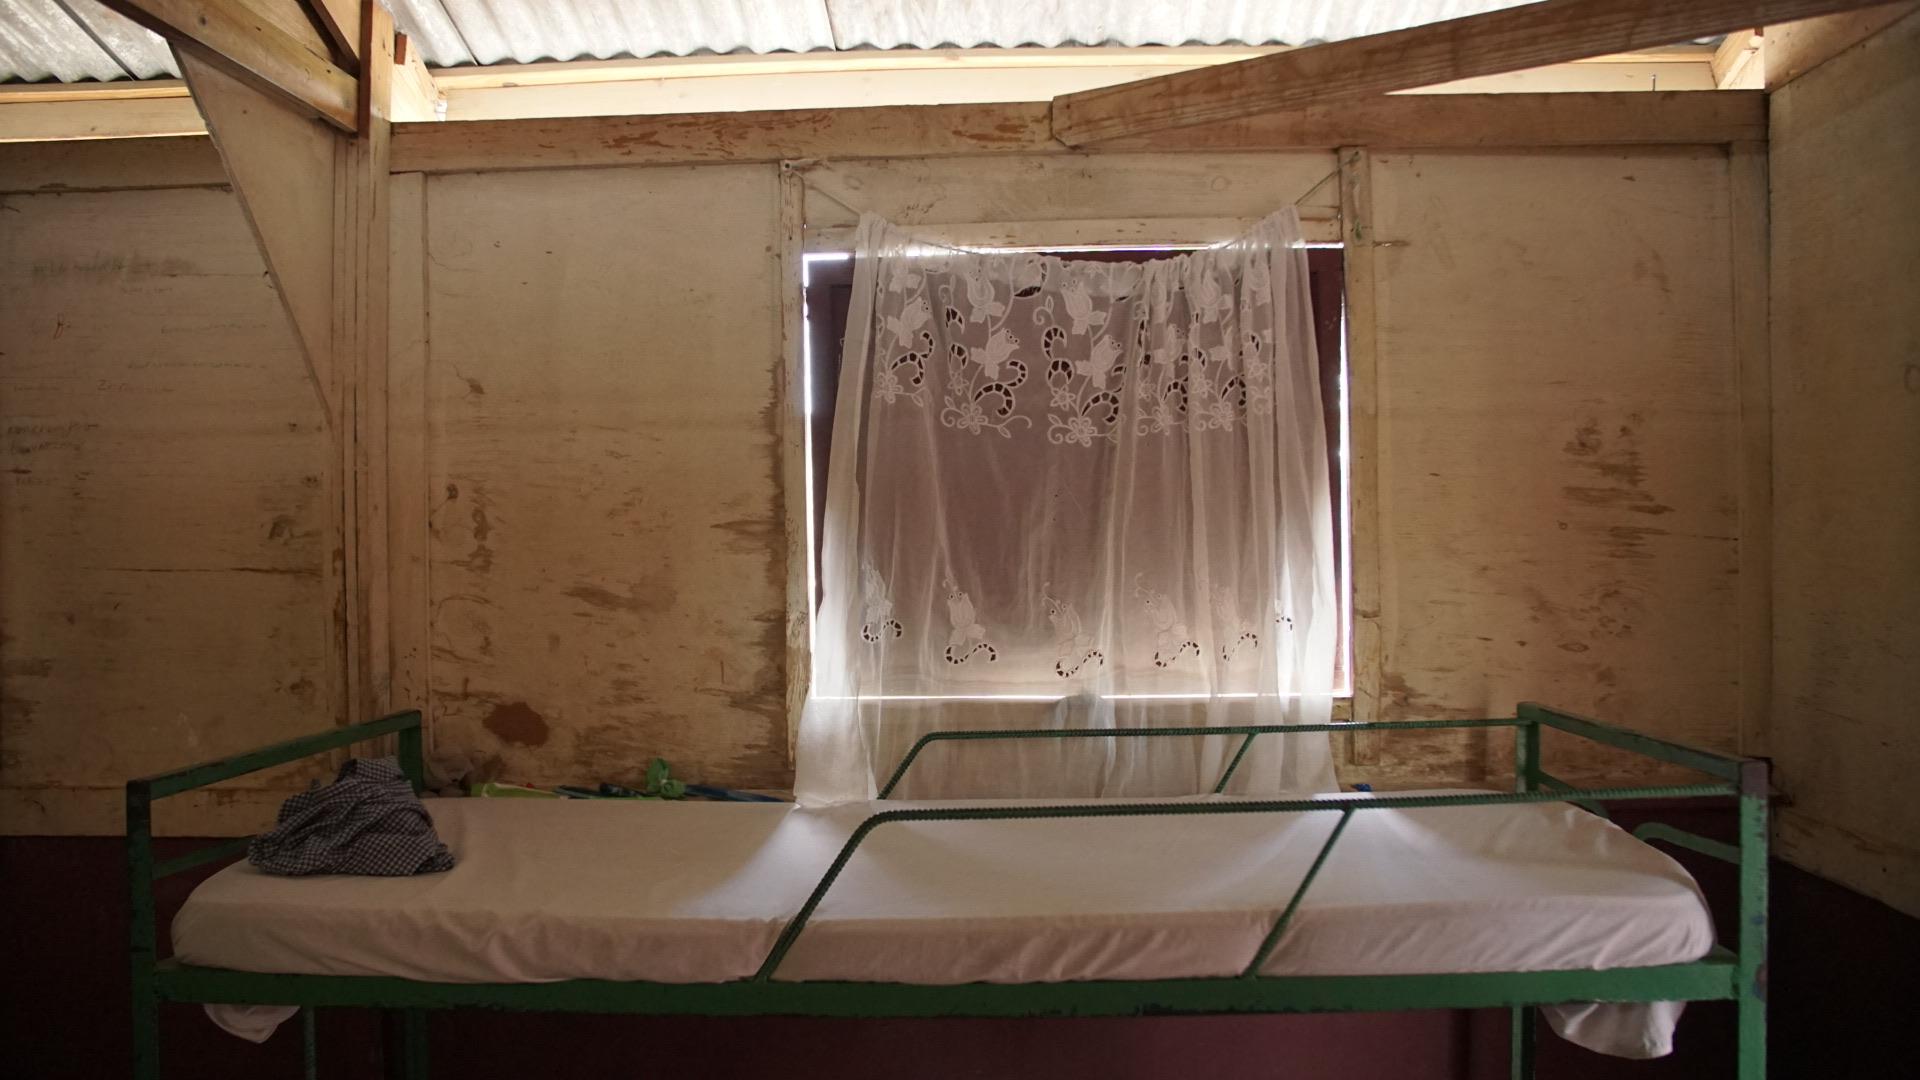 Haitian Orphanage Sleeping Area